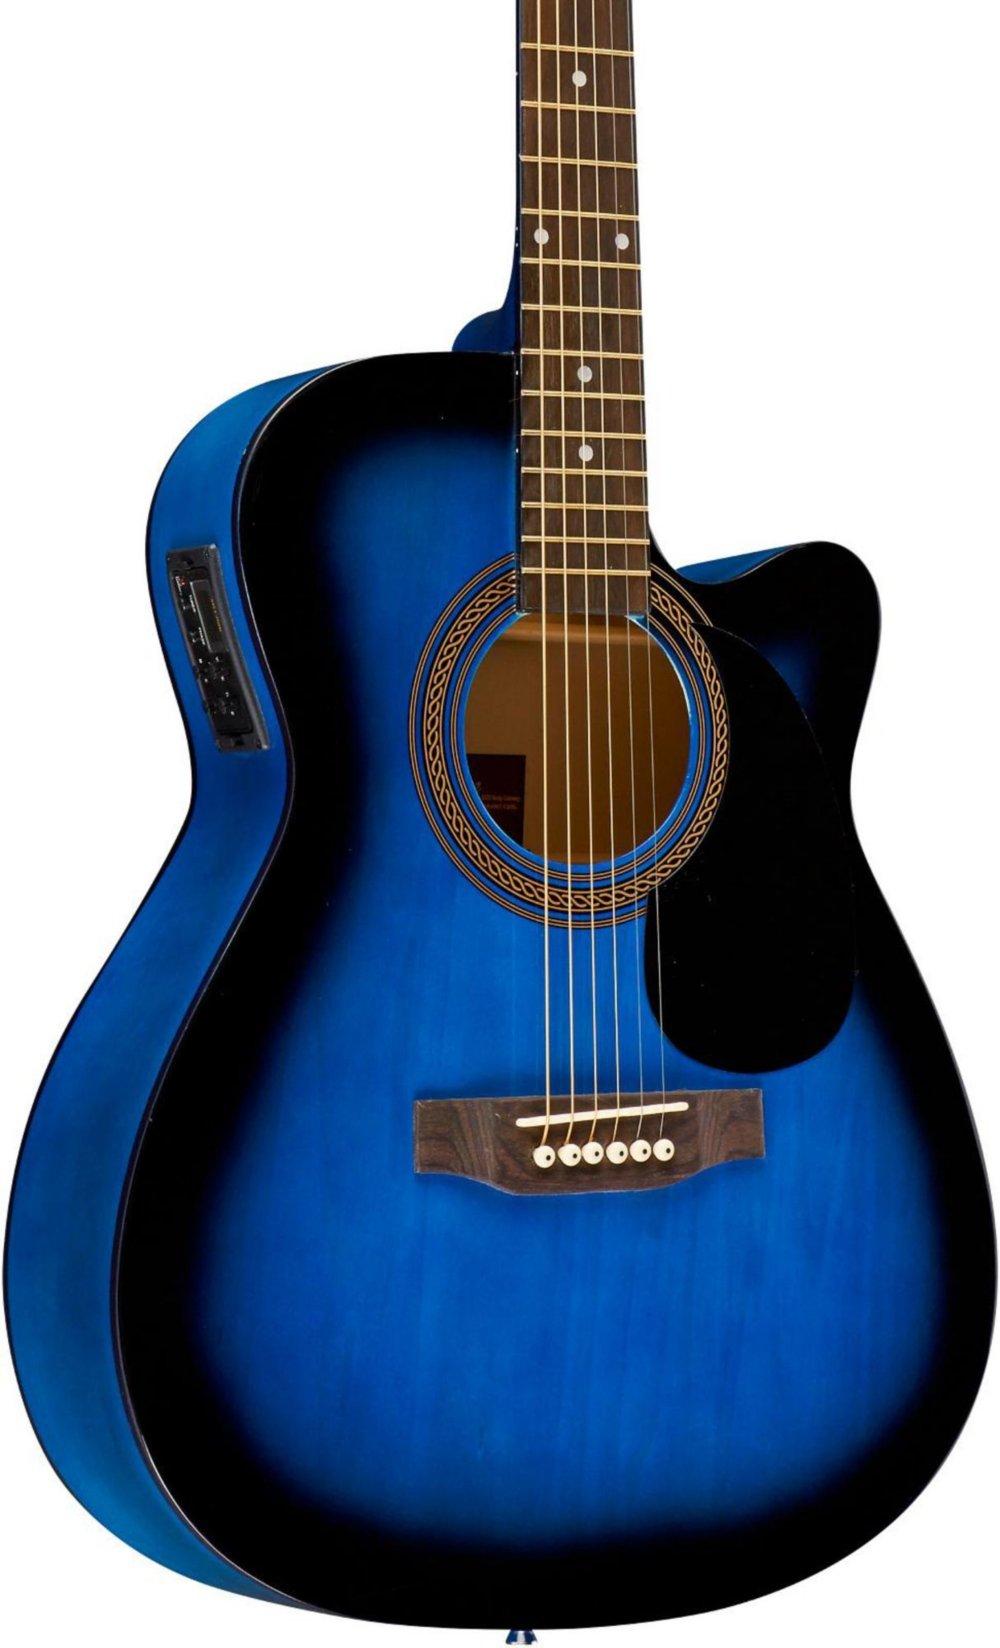 Rogue RA-090 Concert Cutaway Acoustic-Electric Guitar Blue Burst